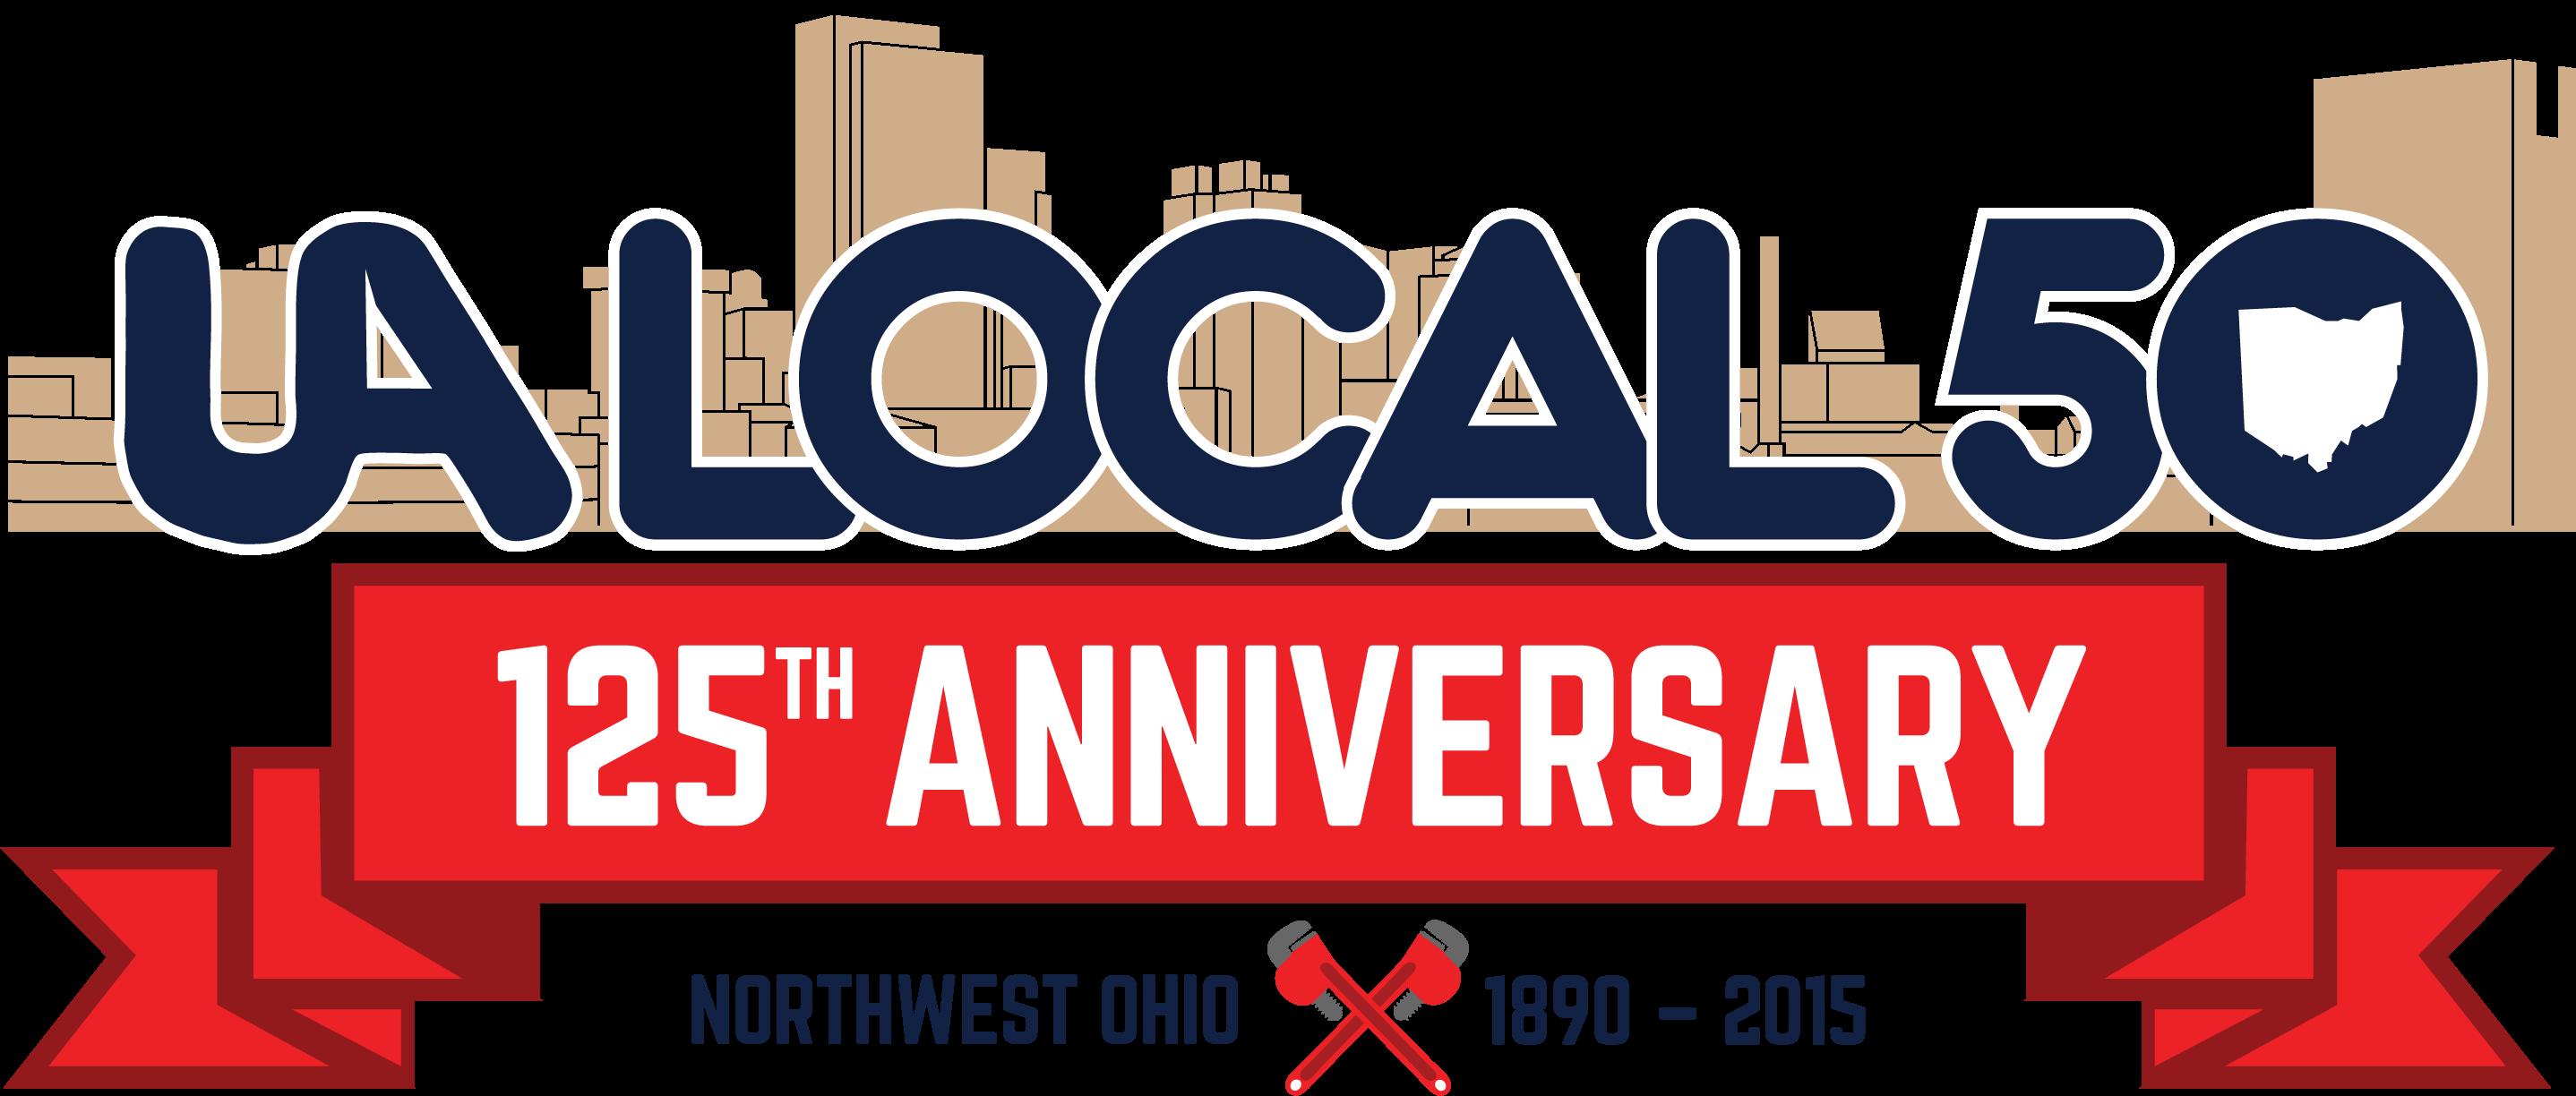 UA Local 50 125th Anniversary Celebration